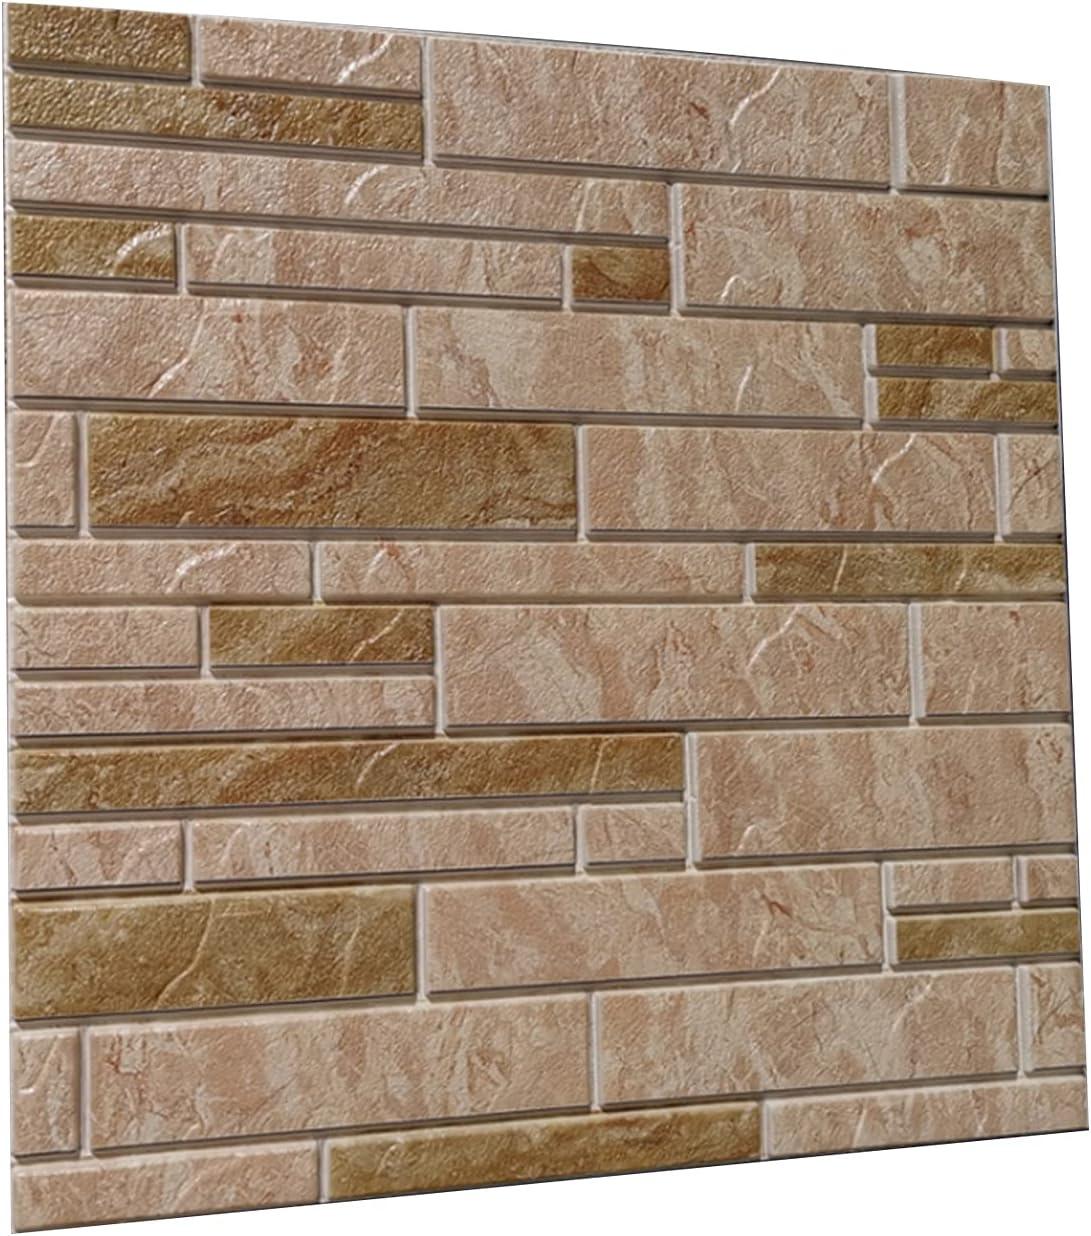 GLUDGOAT 3D Max 83% OFF Max 56% OFF Wall Panels Self Adhesive Textured Wallpaper Brick